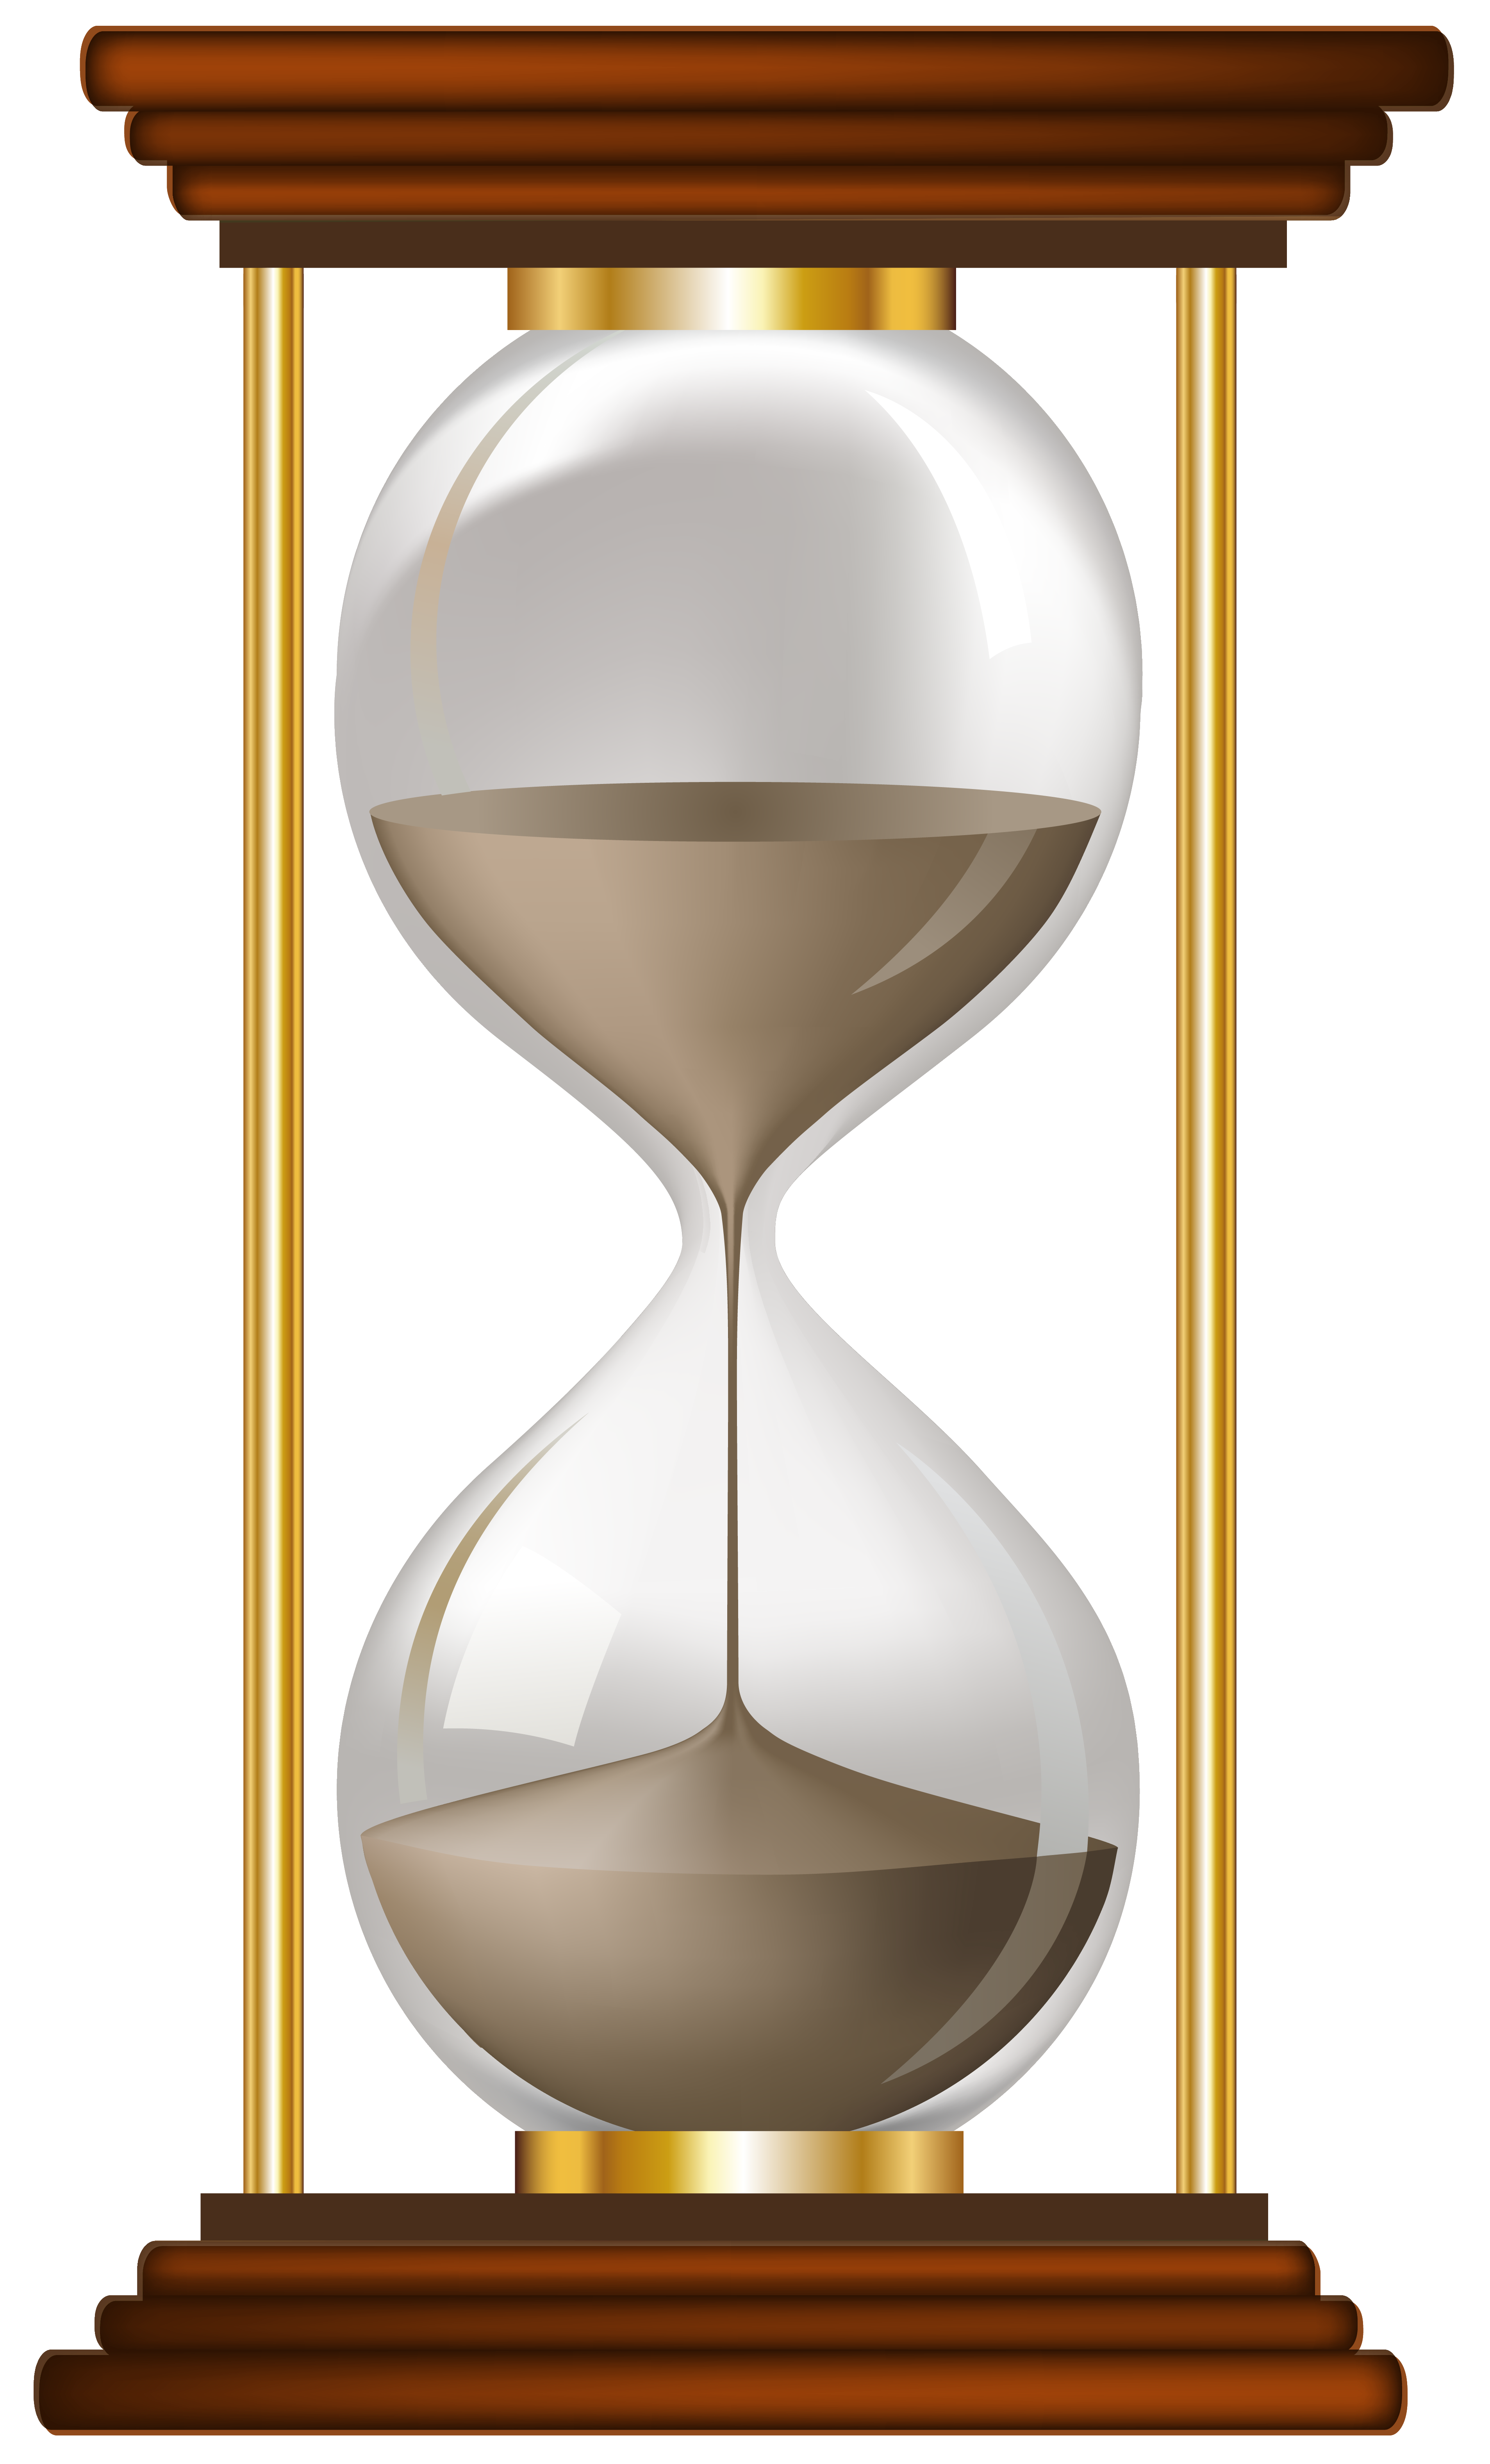 Pin by Unloveable tum*✿* on Clock นาฬิกา.